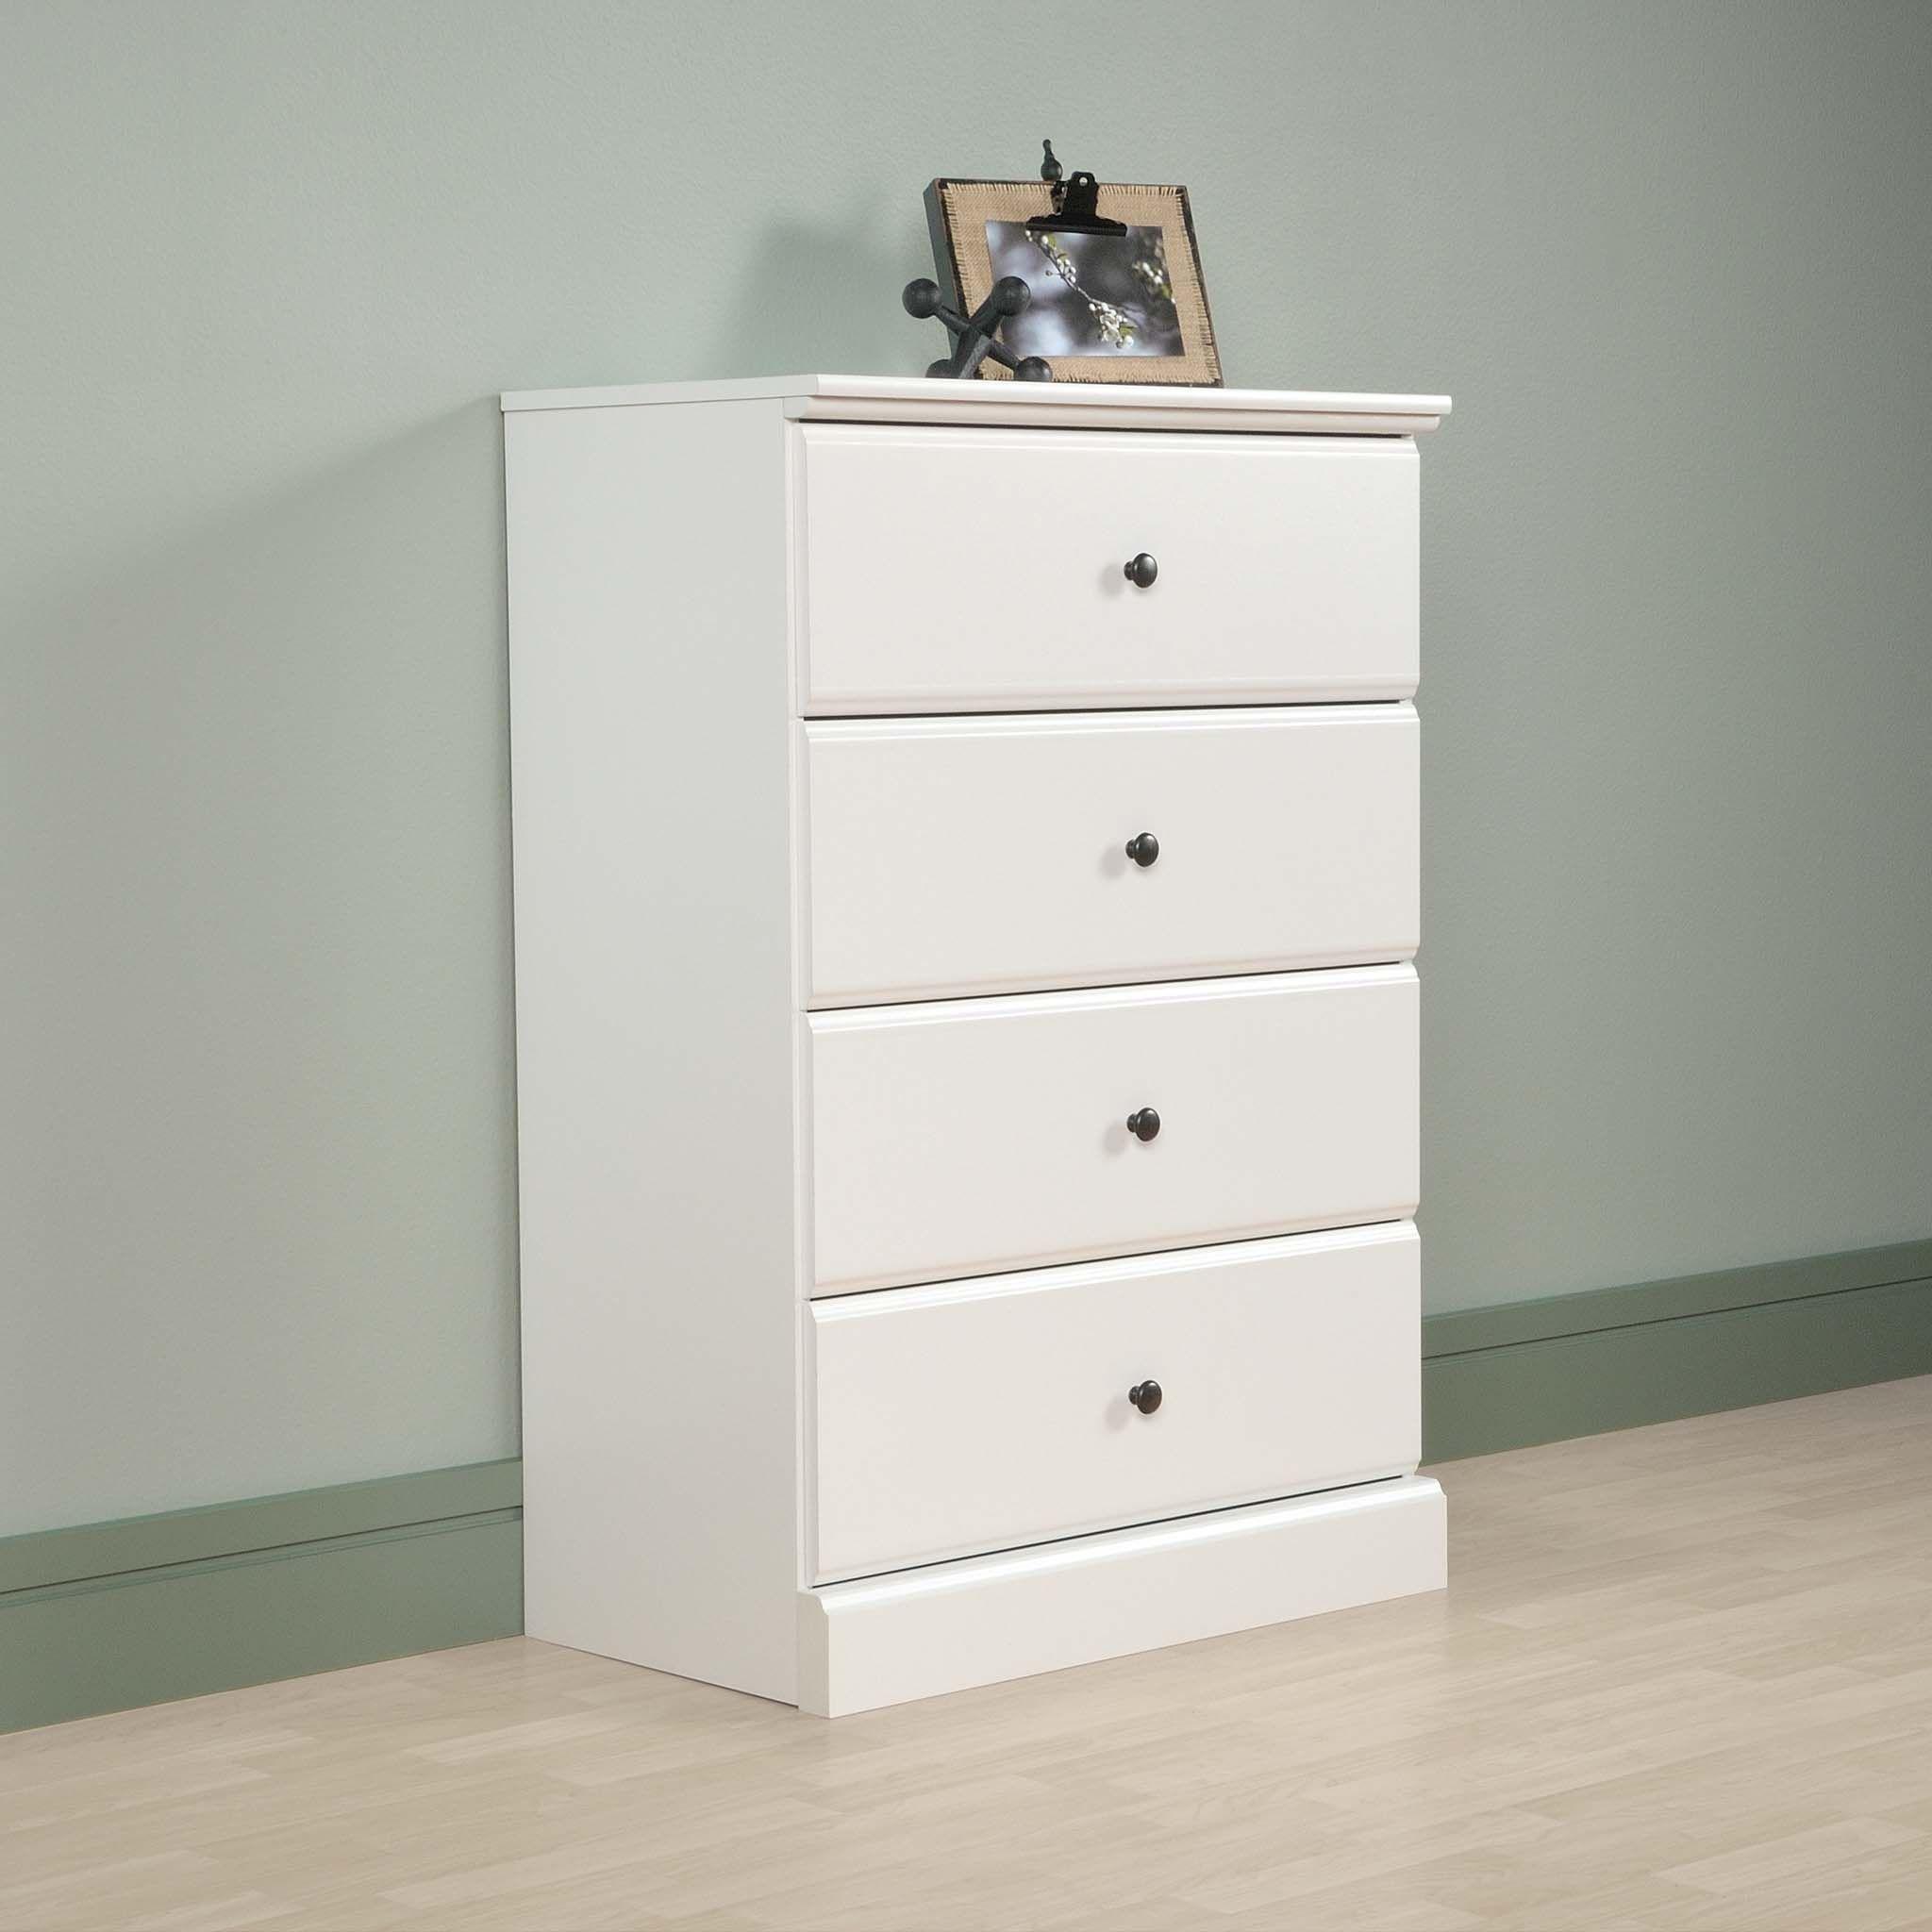 Sauder Parklane Transitional 4 Drawer Chest Soft White Finish Walmart Com Chest Of Drawers Bedroom Dressers Drawers [ 2048 x 2048 Pixel ]